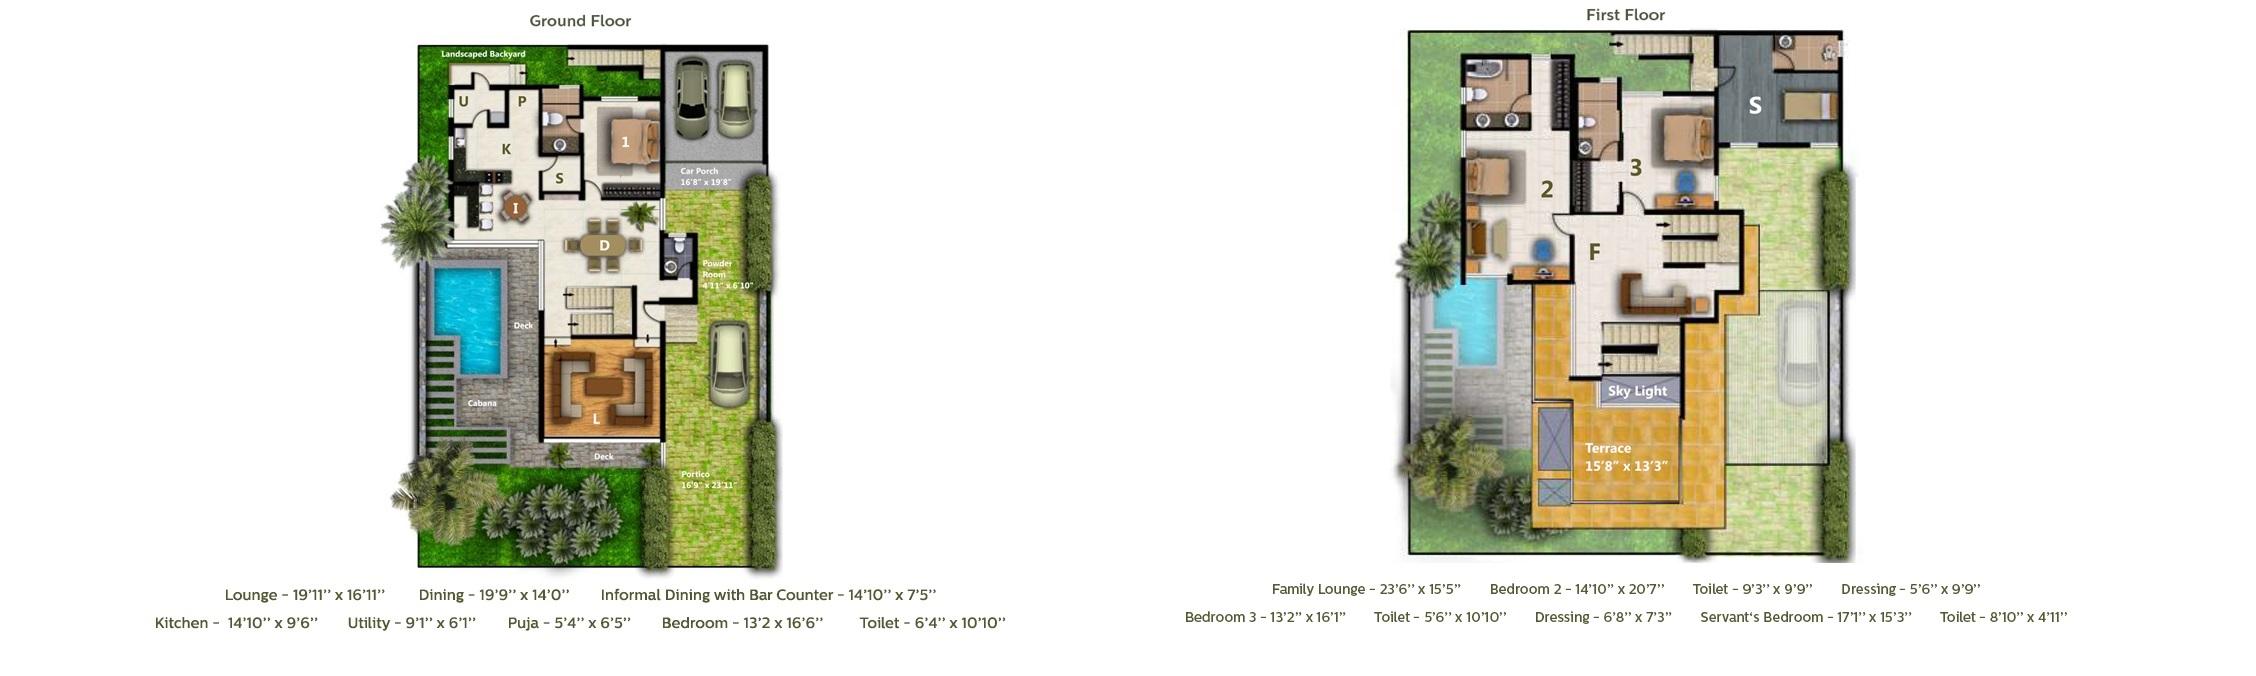 fire luxur the empyrean phase 1 apartment 4bhk 6329sqft181